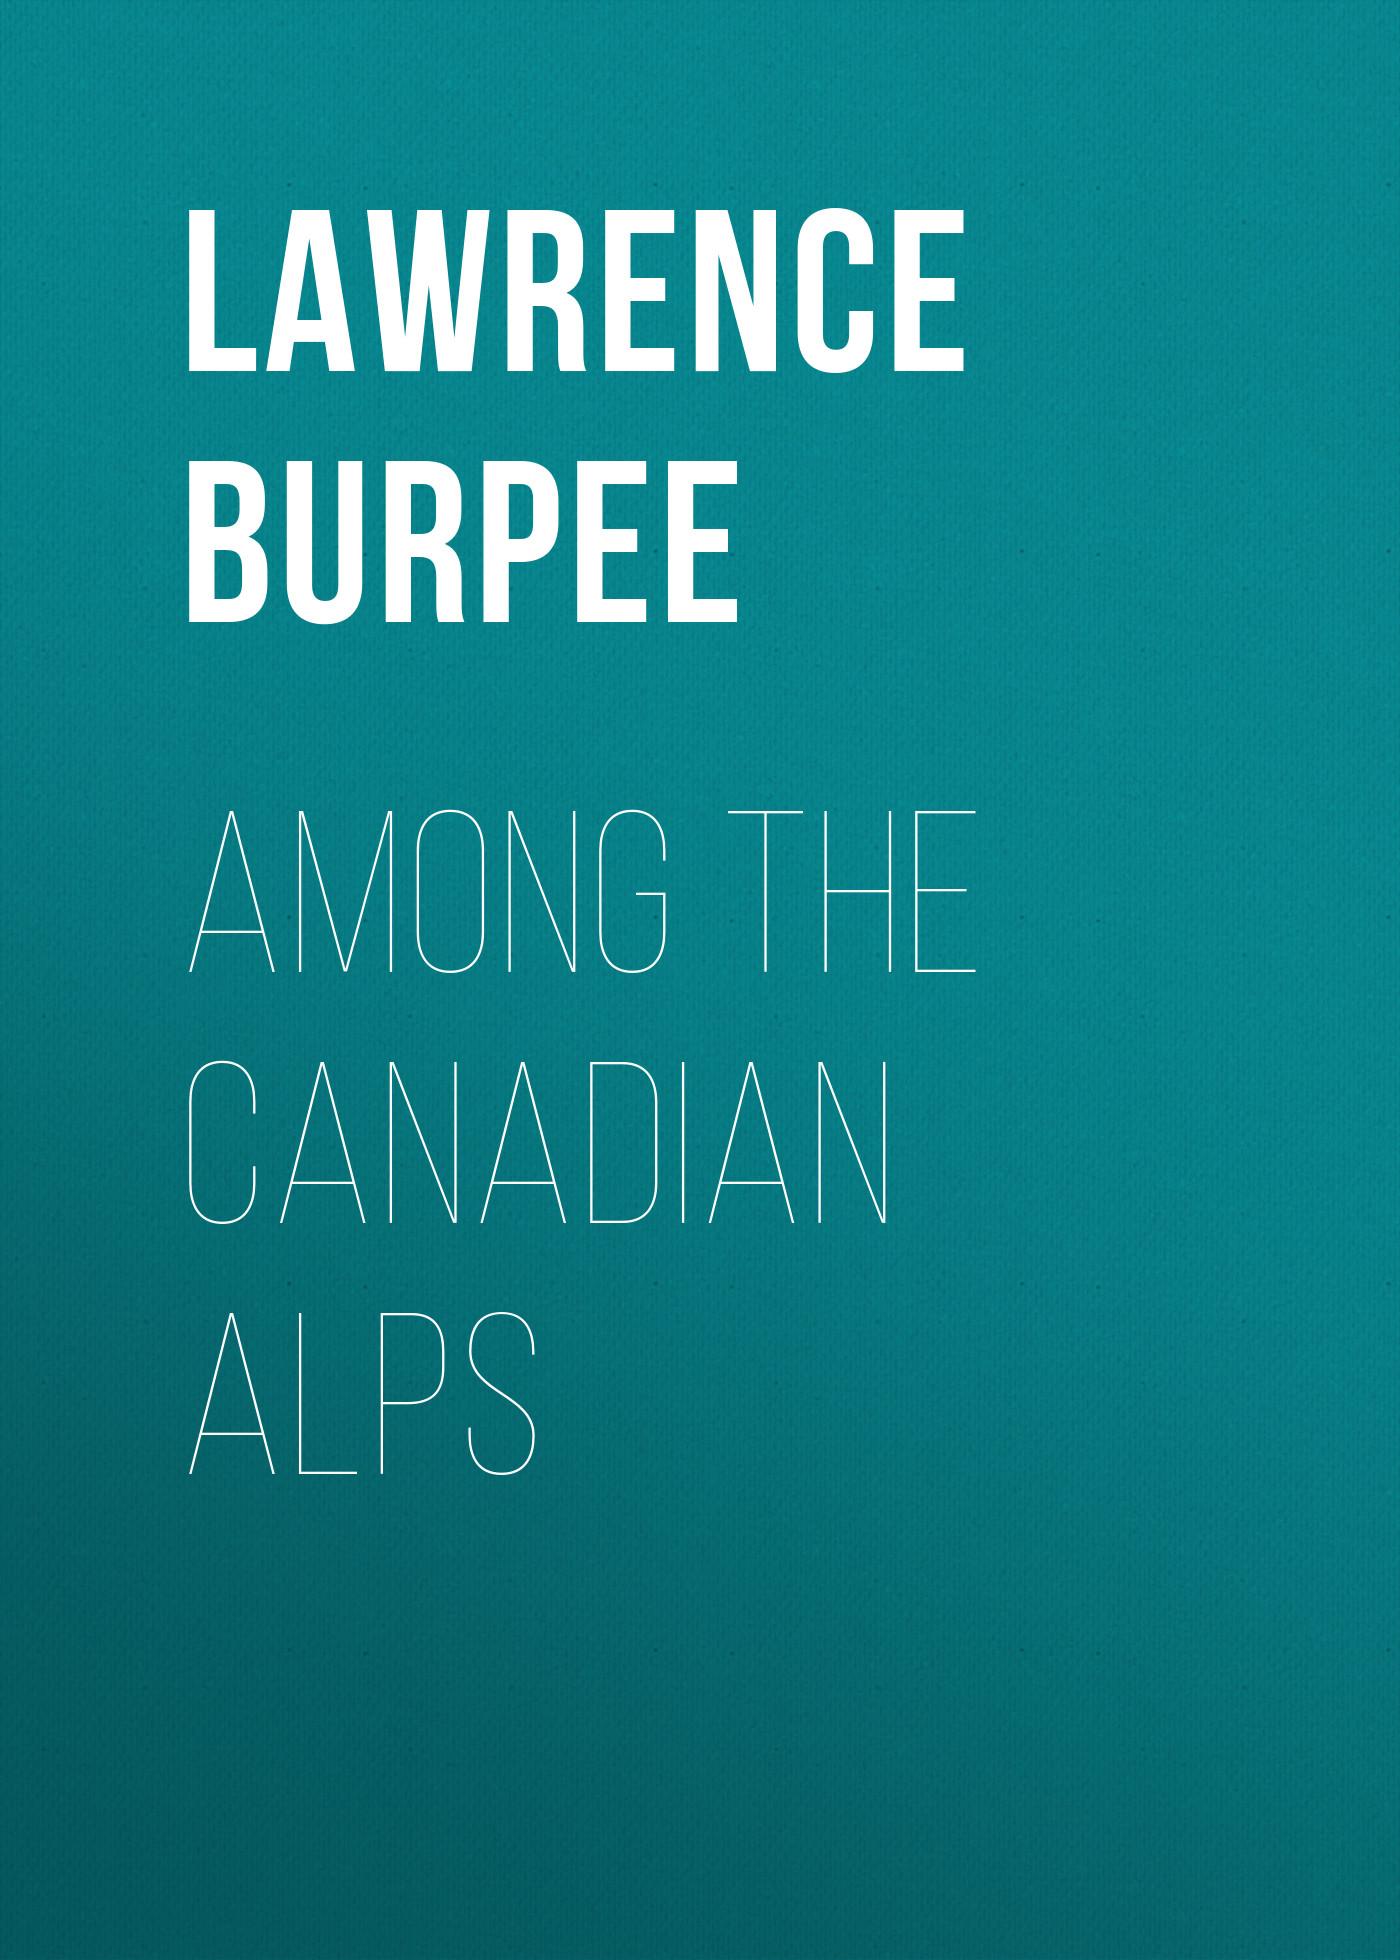 Burpee Lawrence Johnstone Among the Canadian Alps christian isobel johnstone elizabeth de bruce